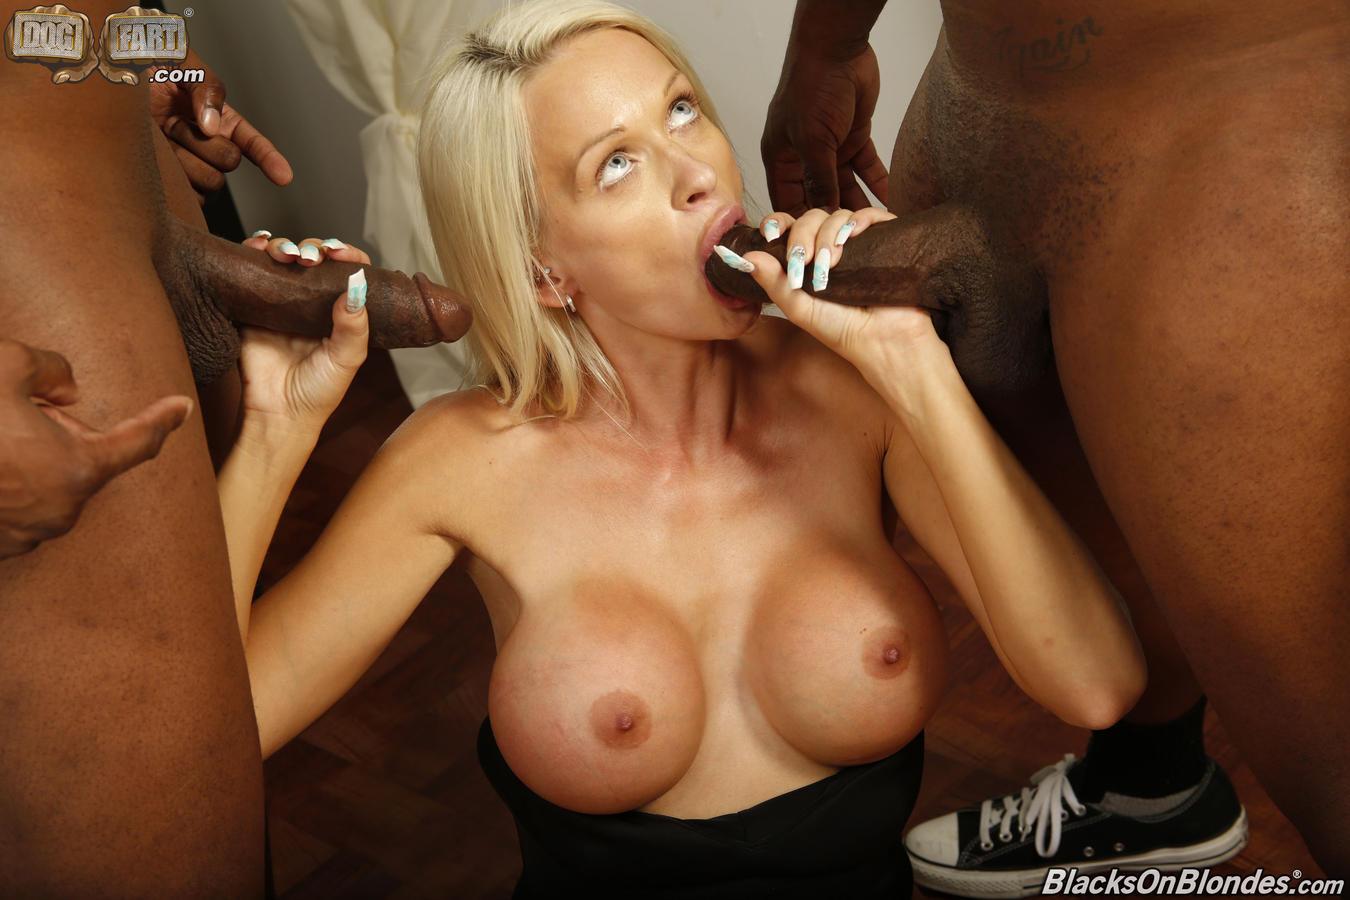 Cindy shine tries hardcore group interracial sex